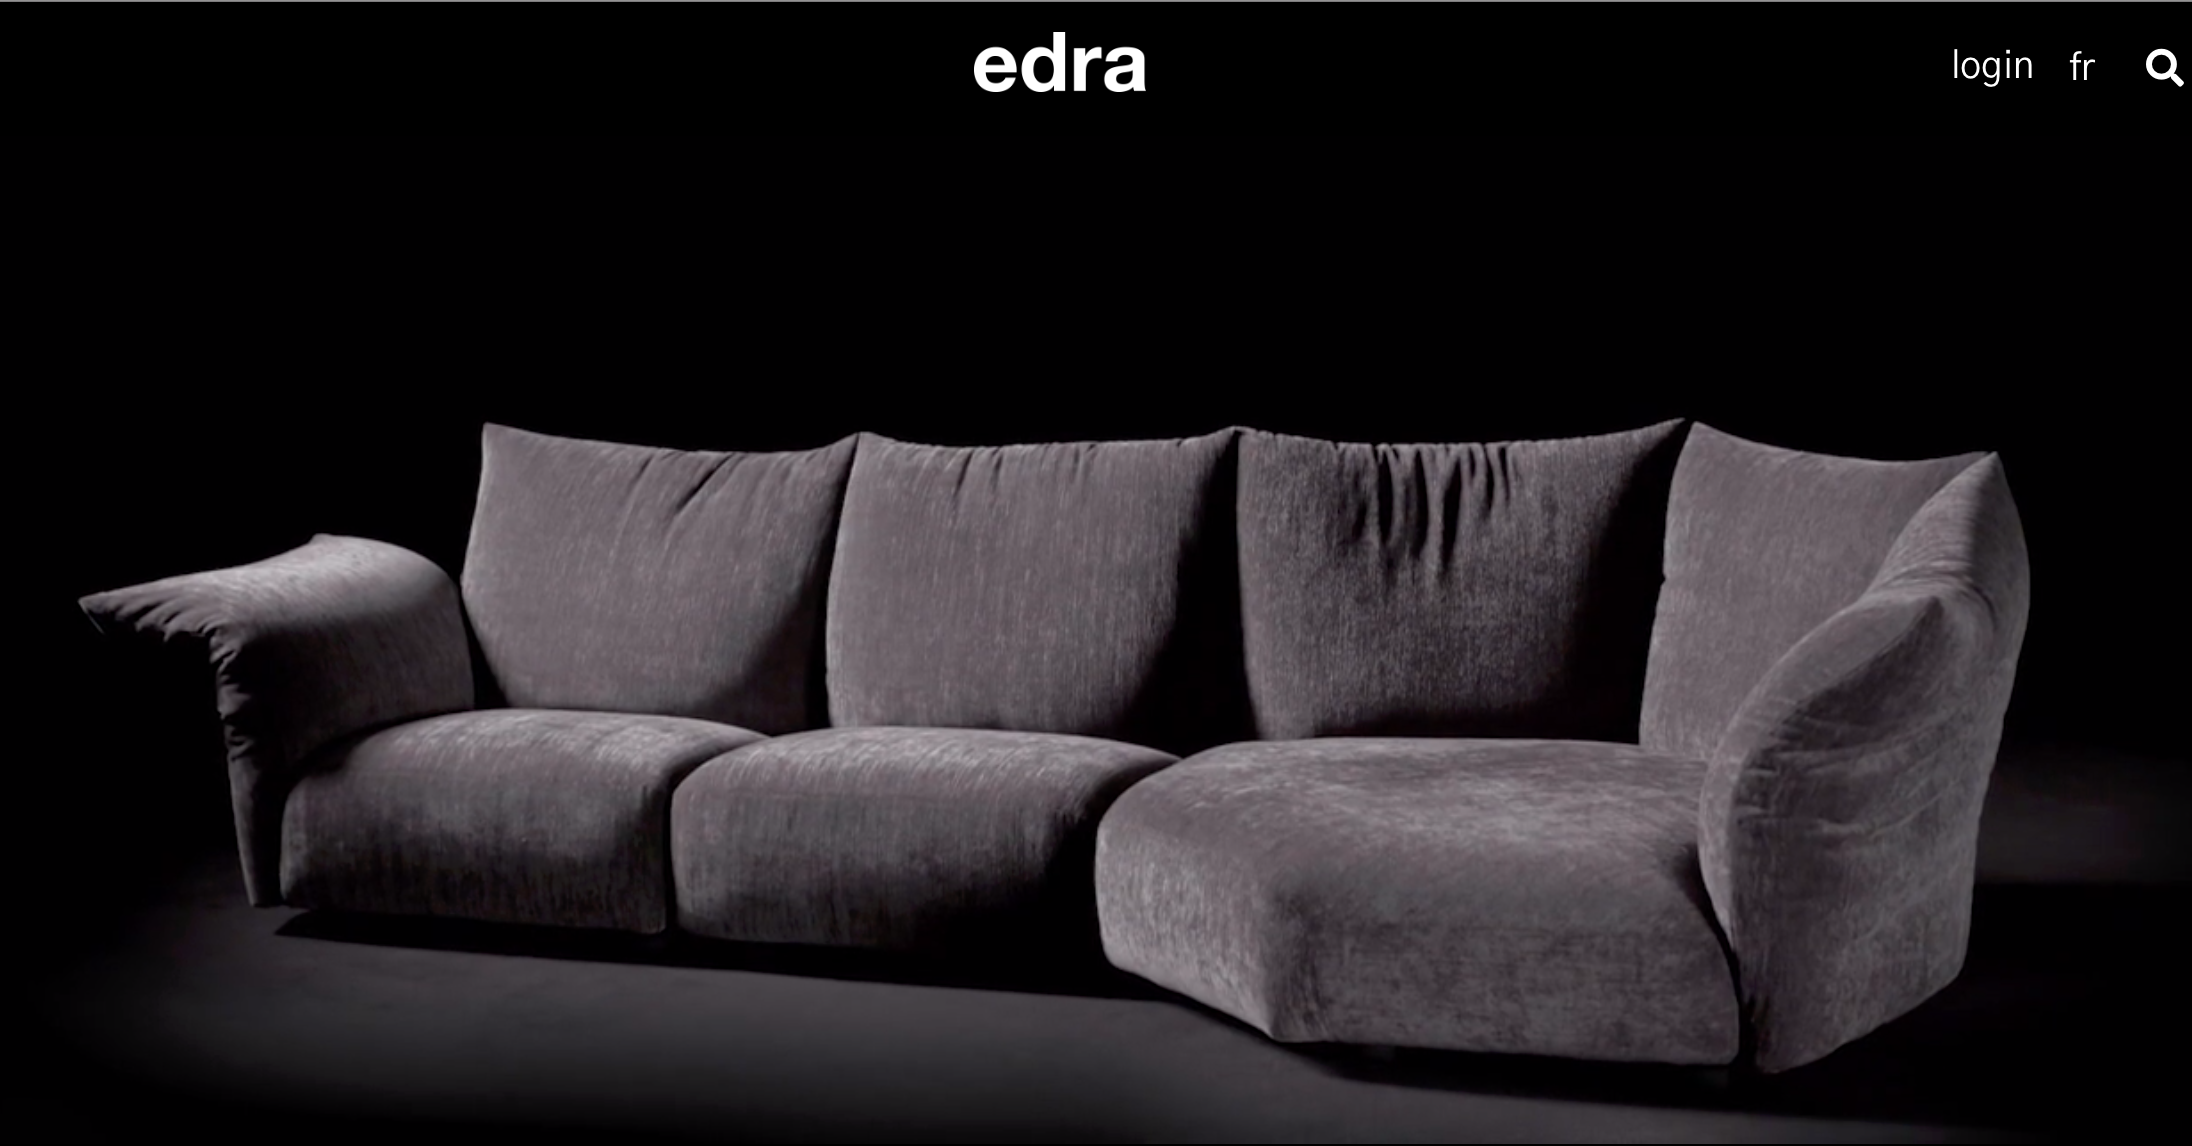 Canape Edra In 2020